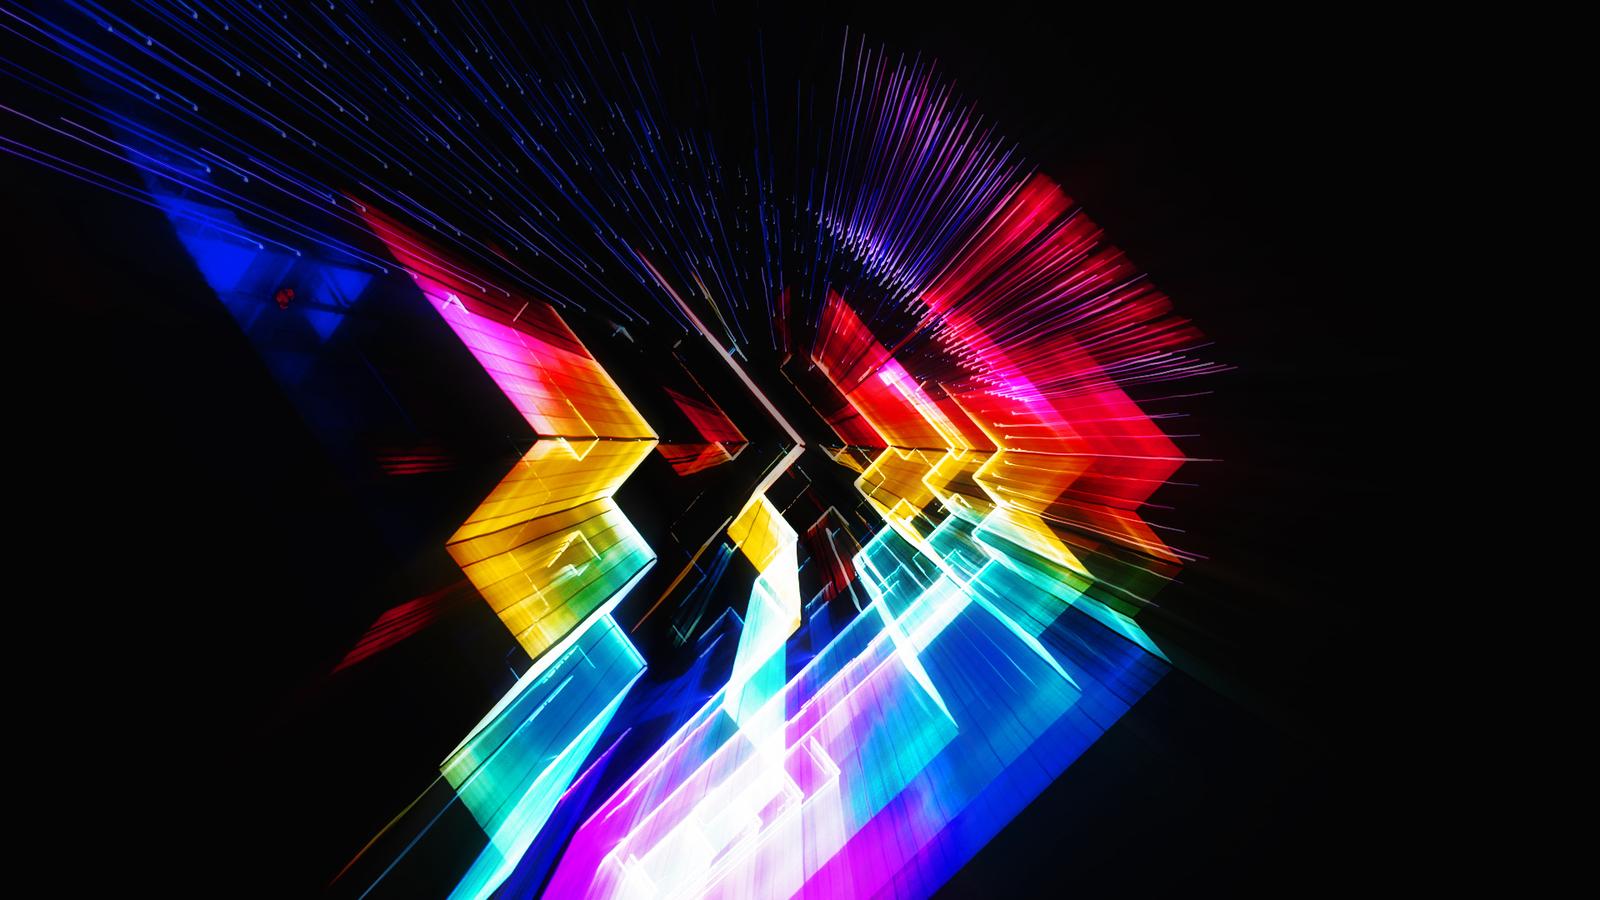 digital-art-colorful-abstract-l7.jpg